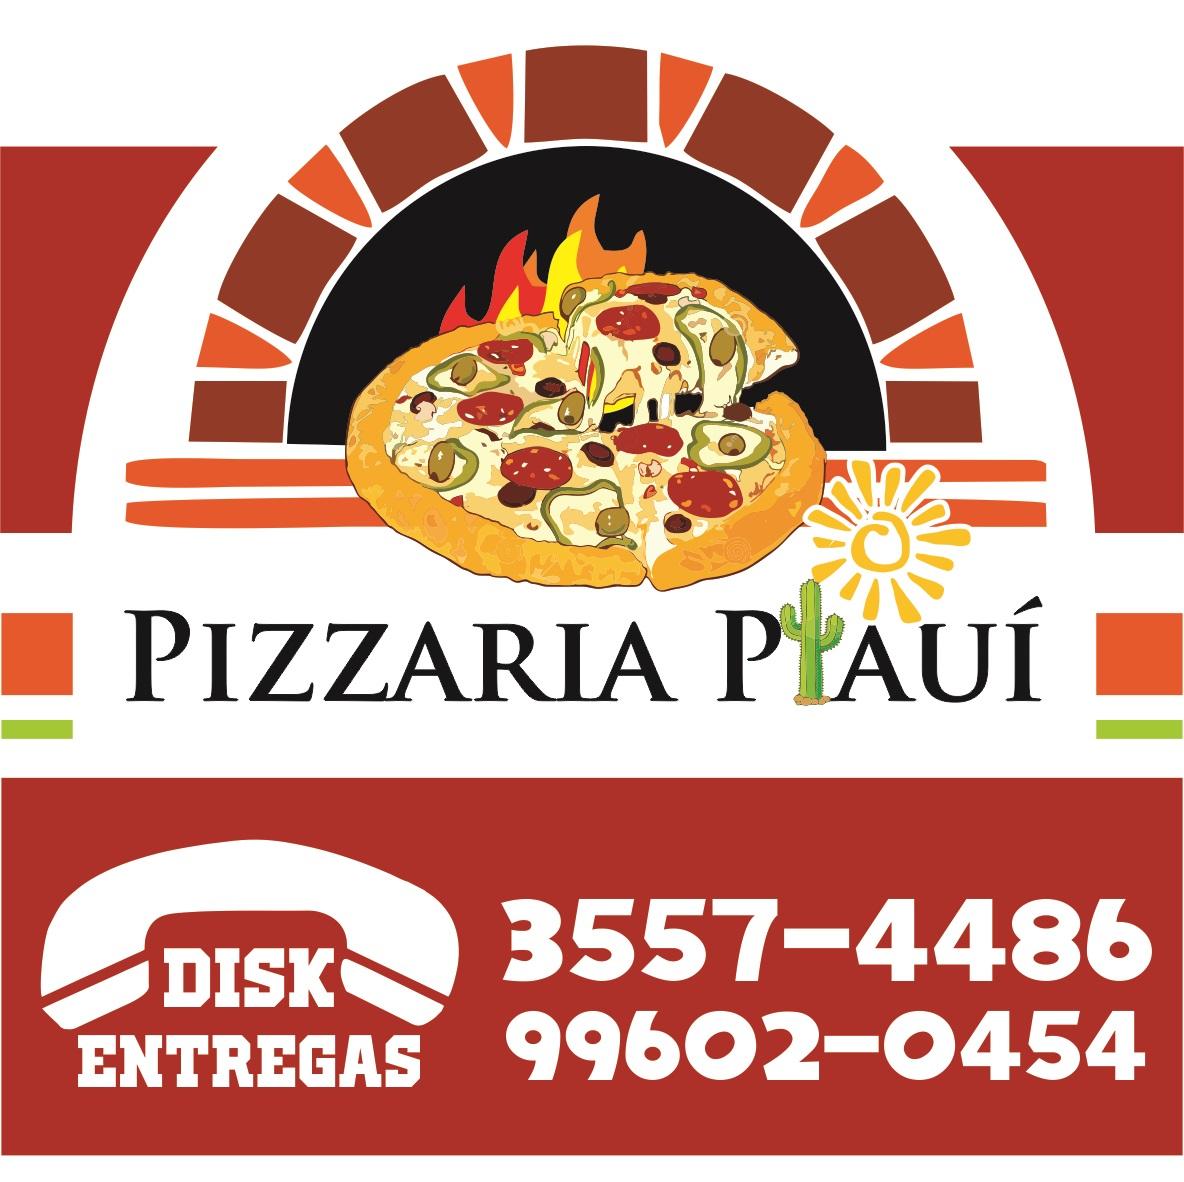 Pizzaria Piauí